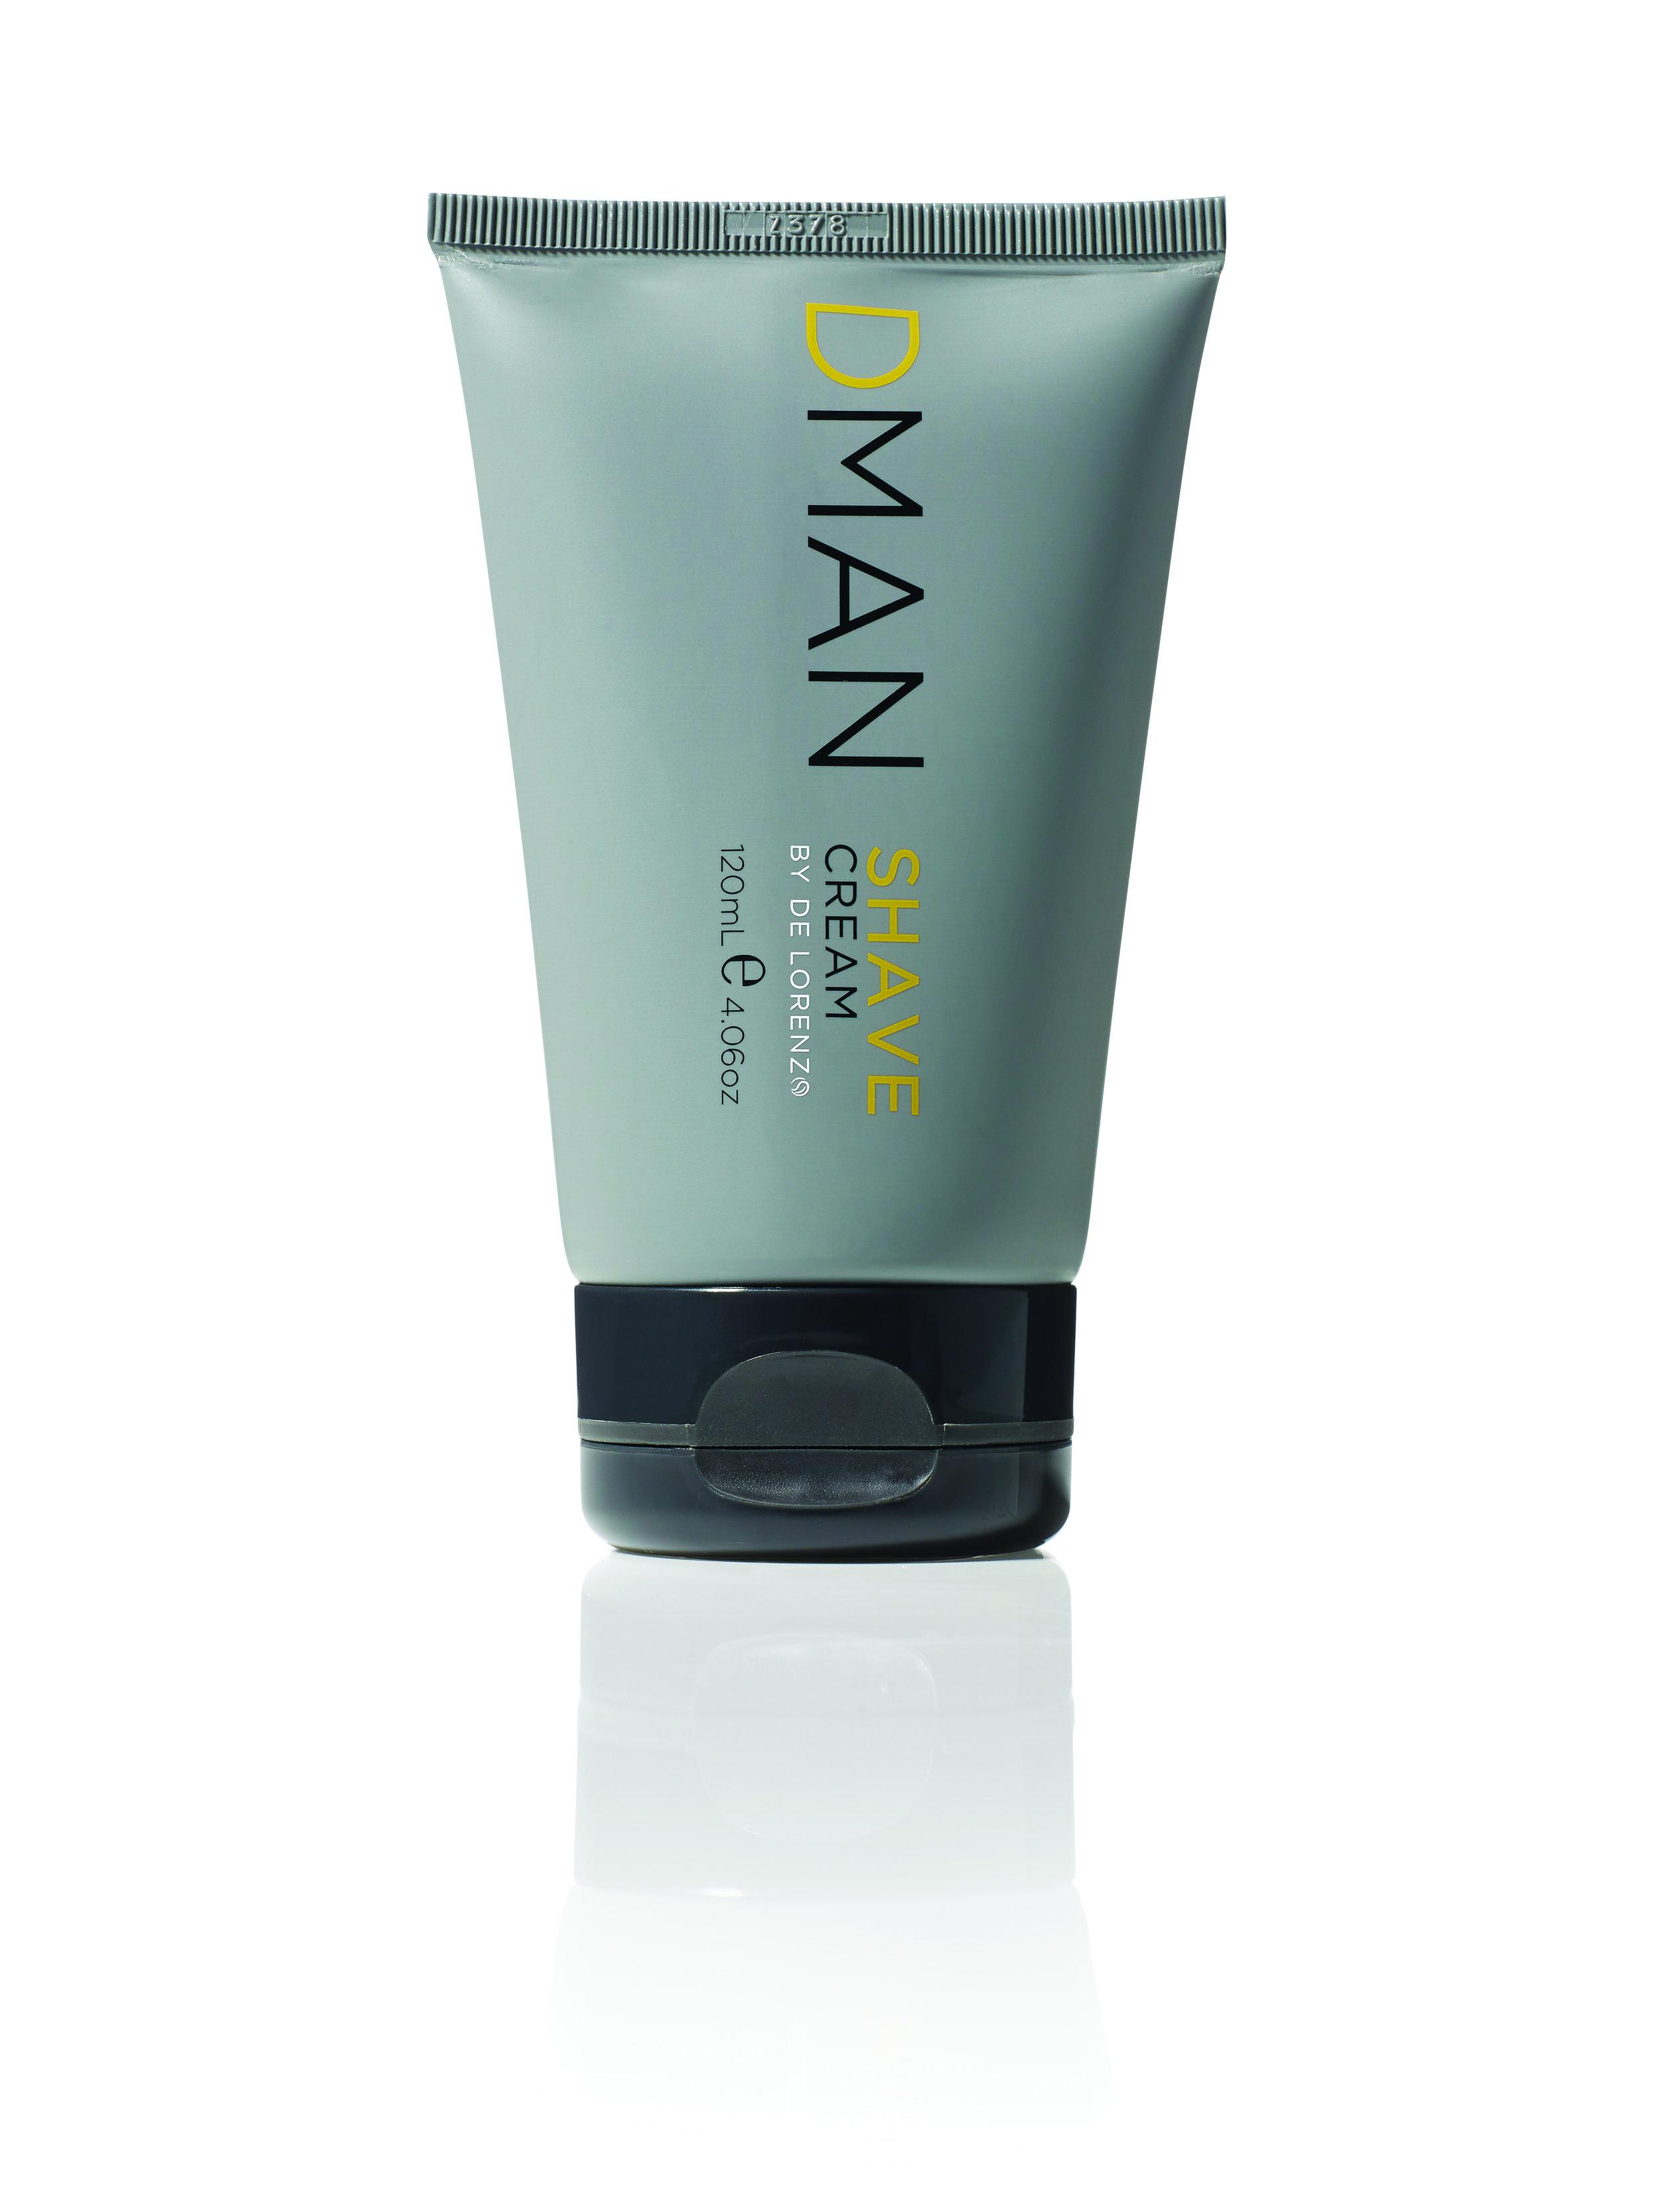 DMAN_Shave Cream 120mL.jpg